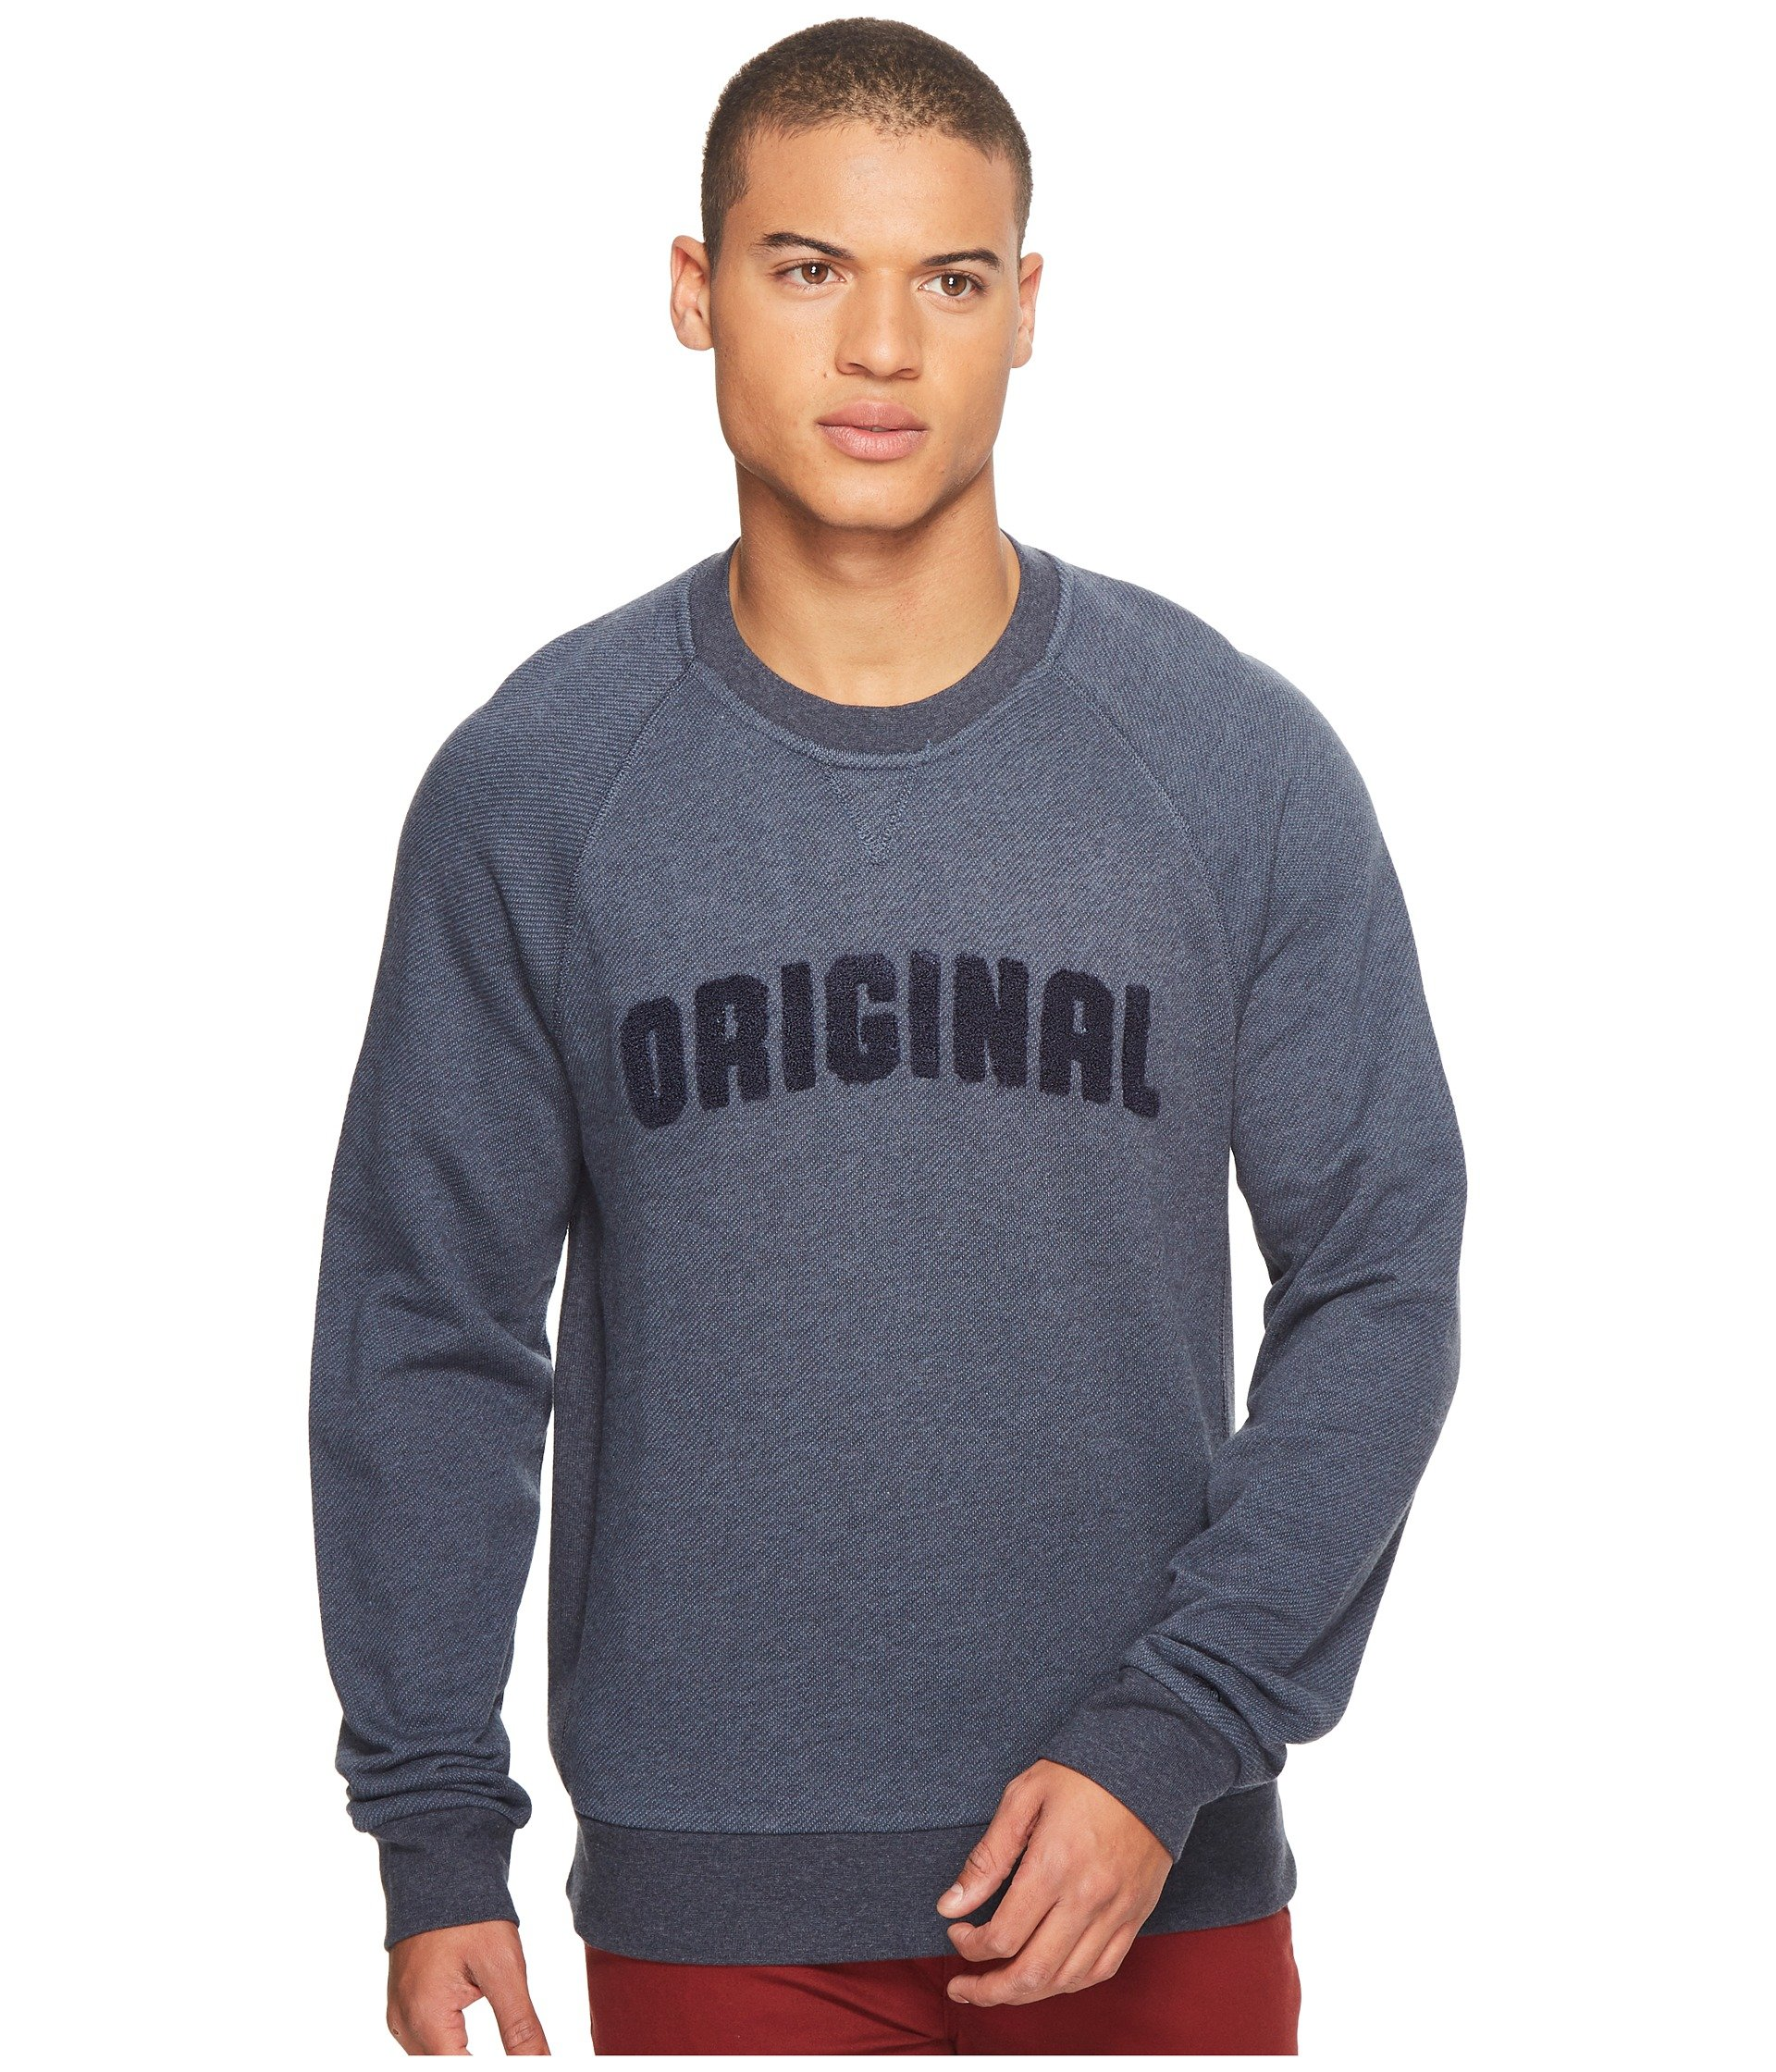 Buzo o Chaqueta Deportiva para Hombre Original Penguin Vintage Gym Long Sleeve Boucle Sweatshirt  + Original Penguin en VeoyCompro.net